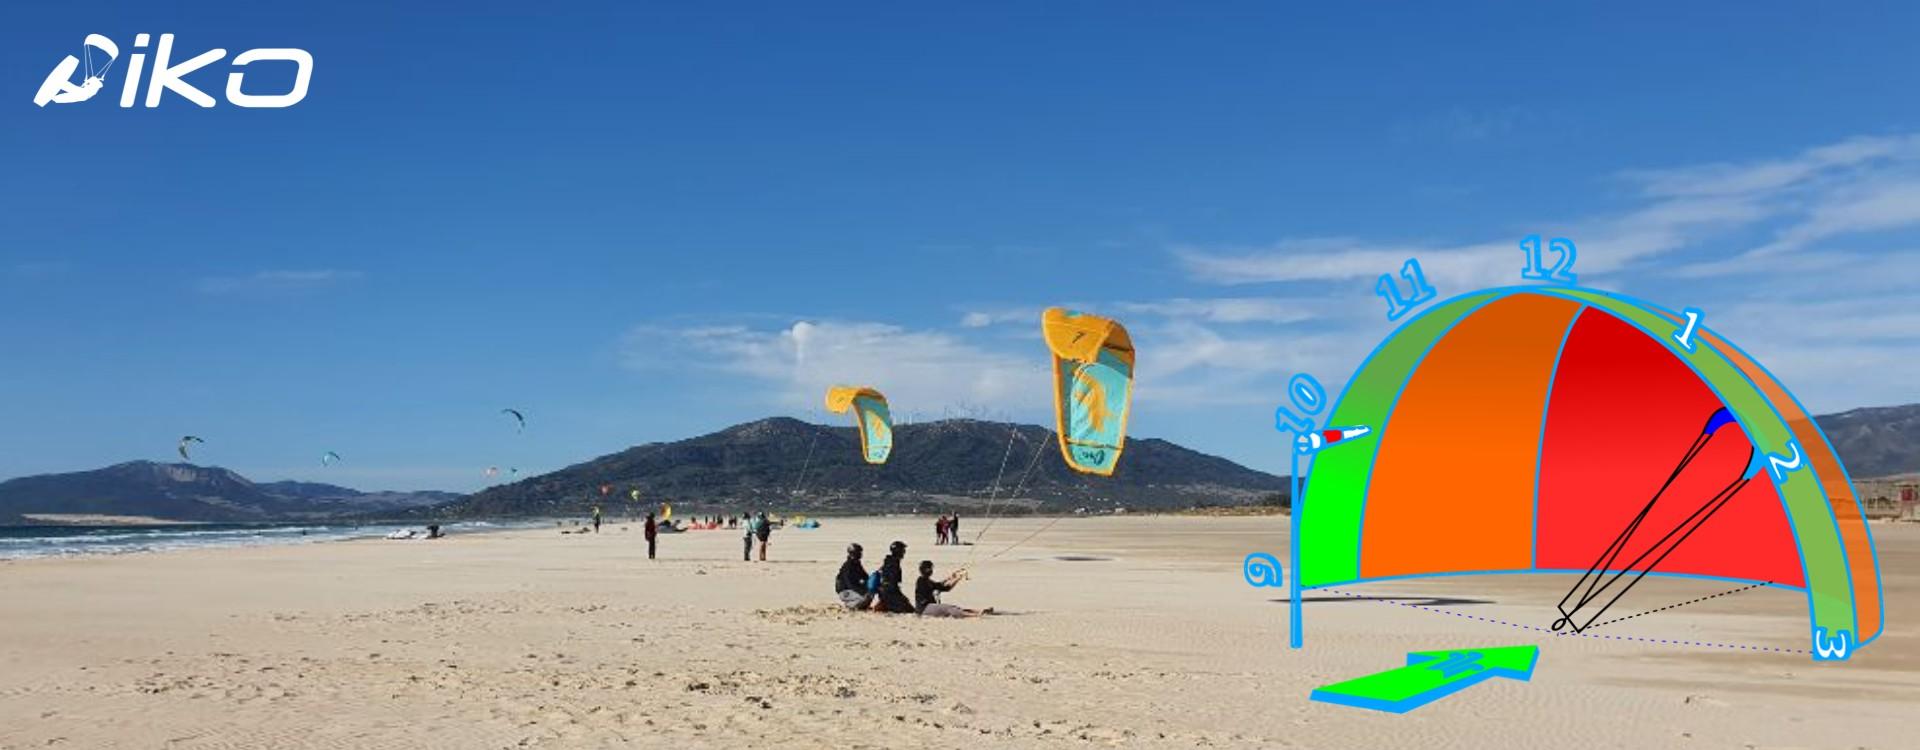 kite clock kitesurfing